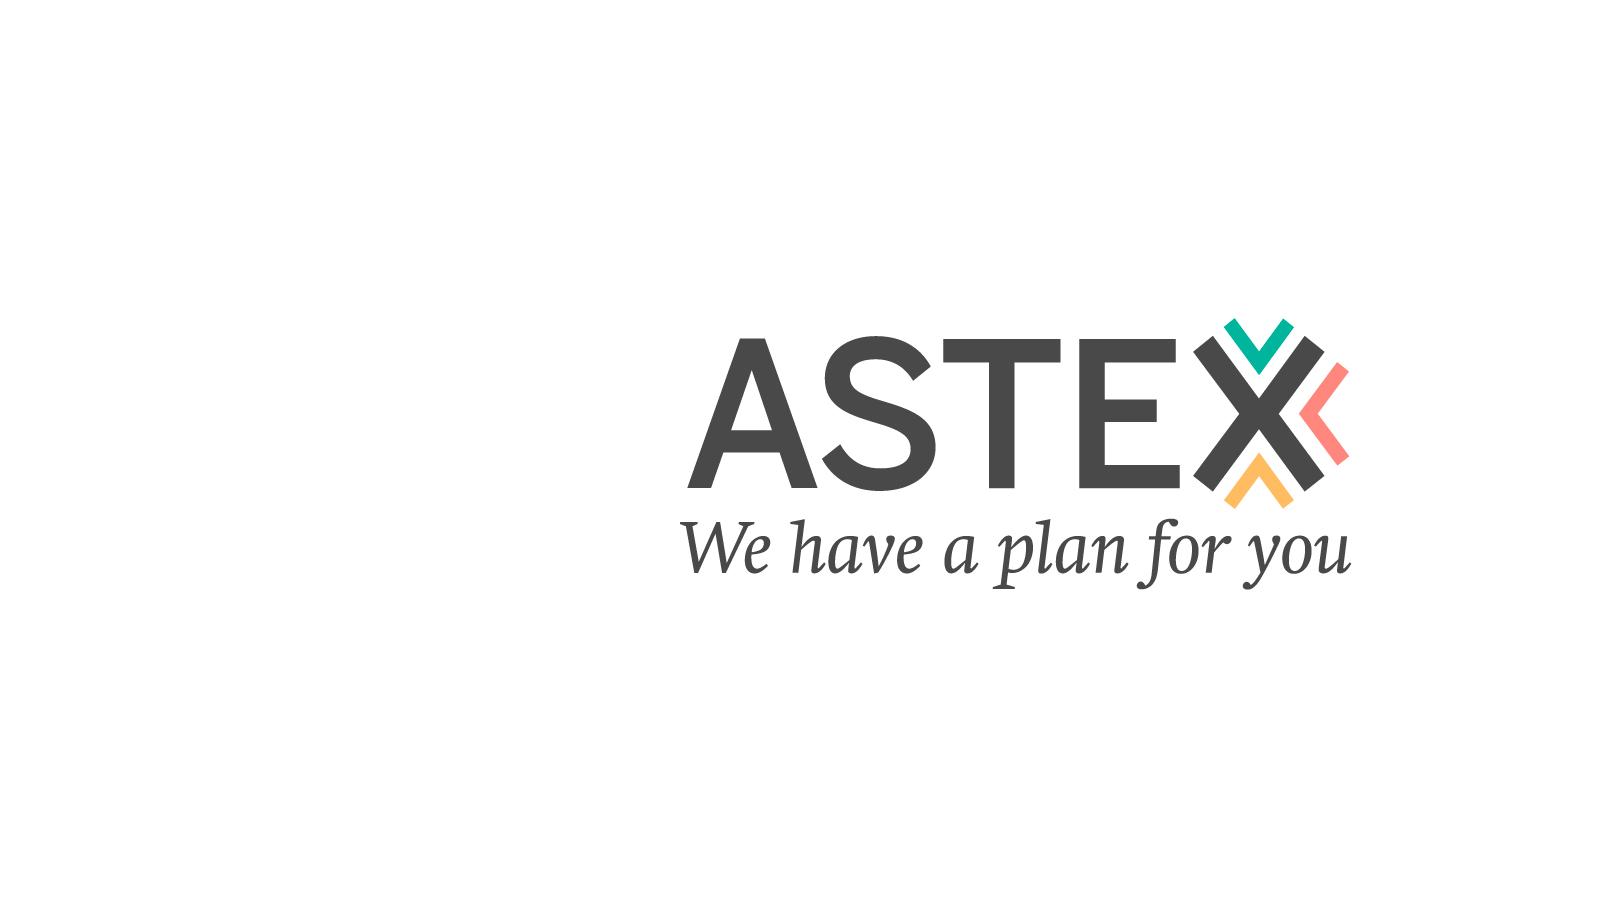 astex_pagina-web_banner05